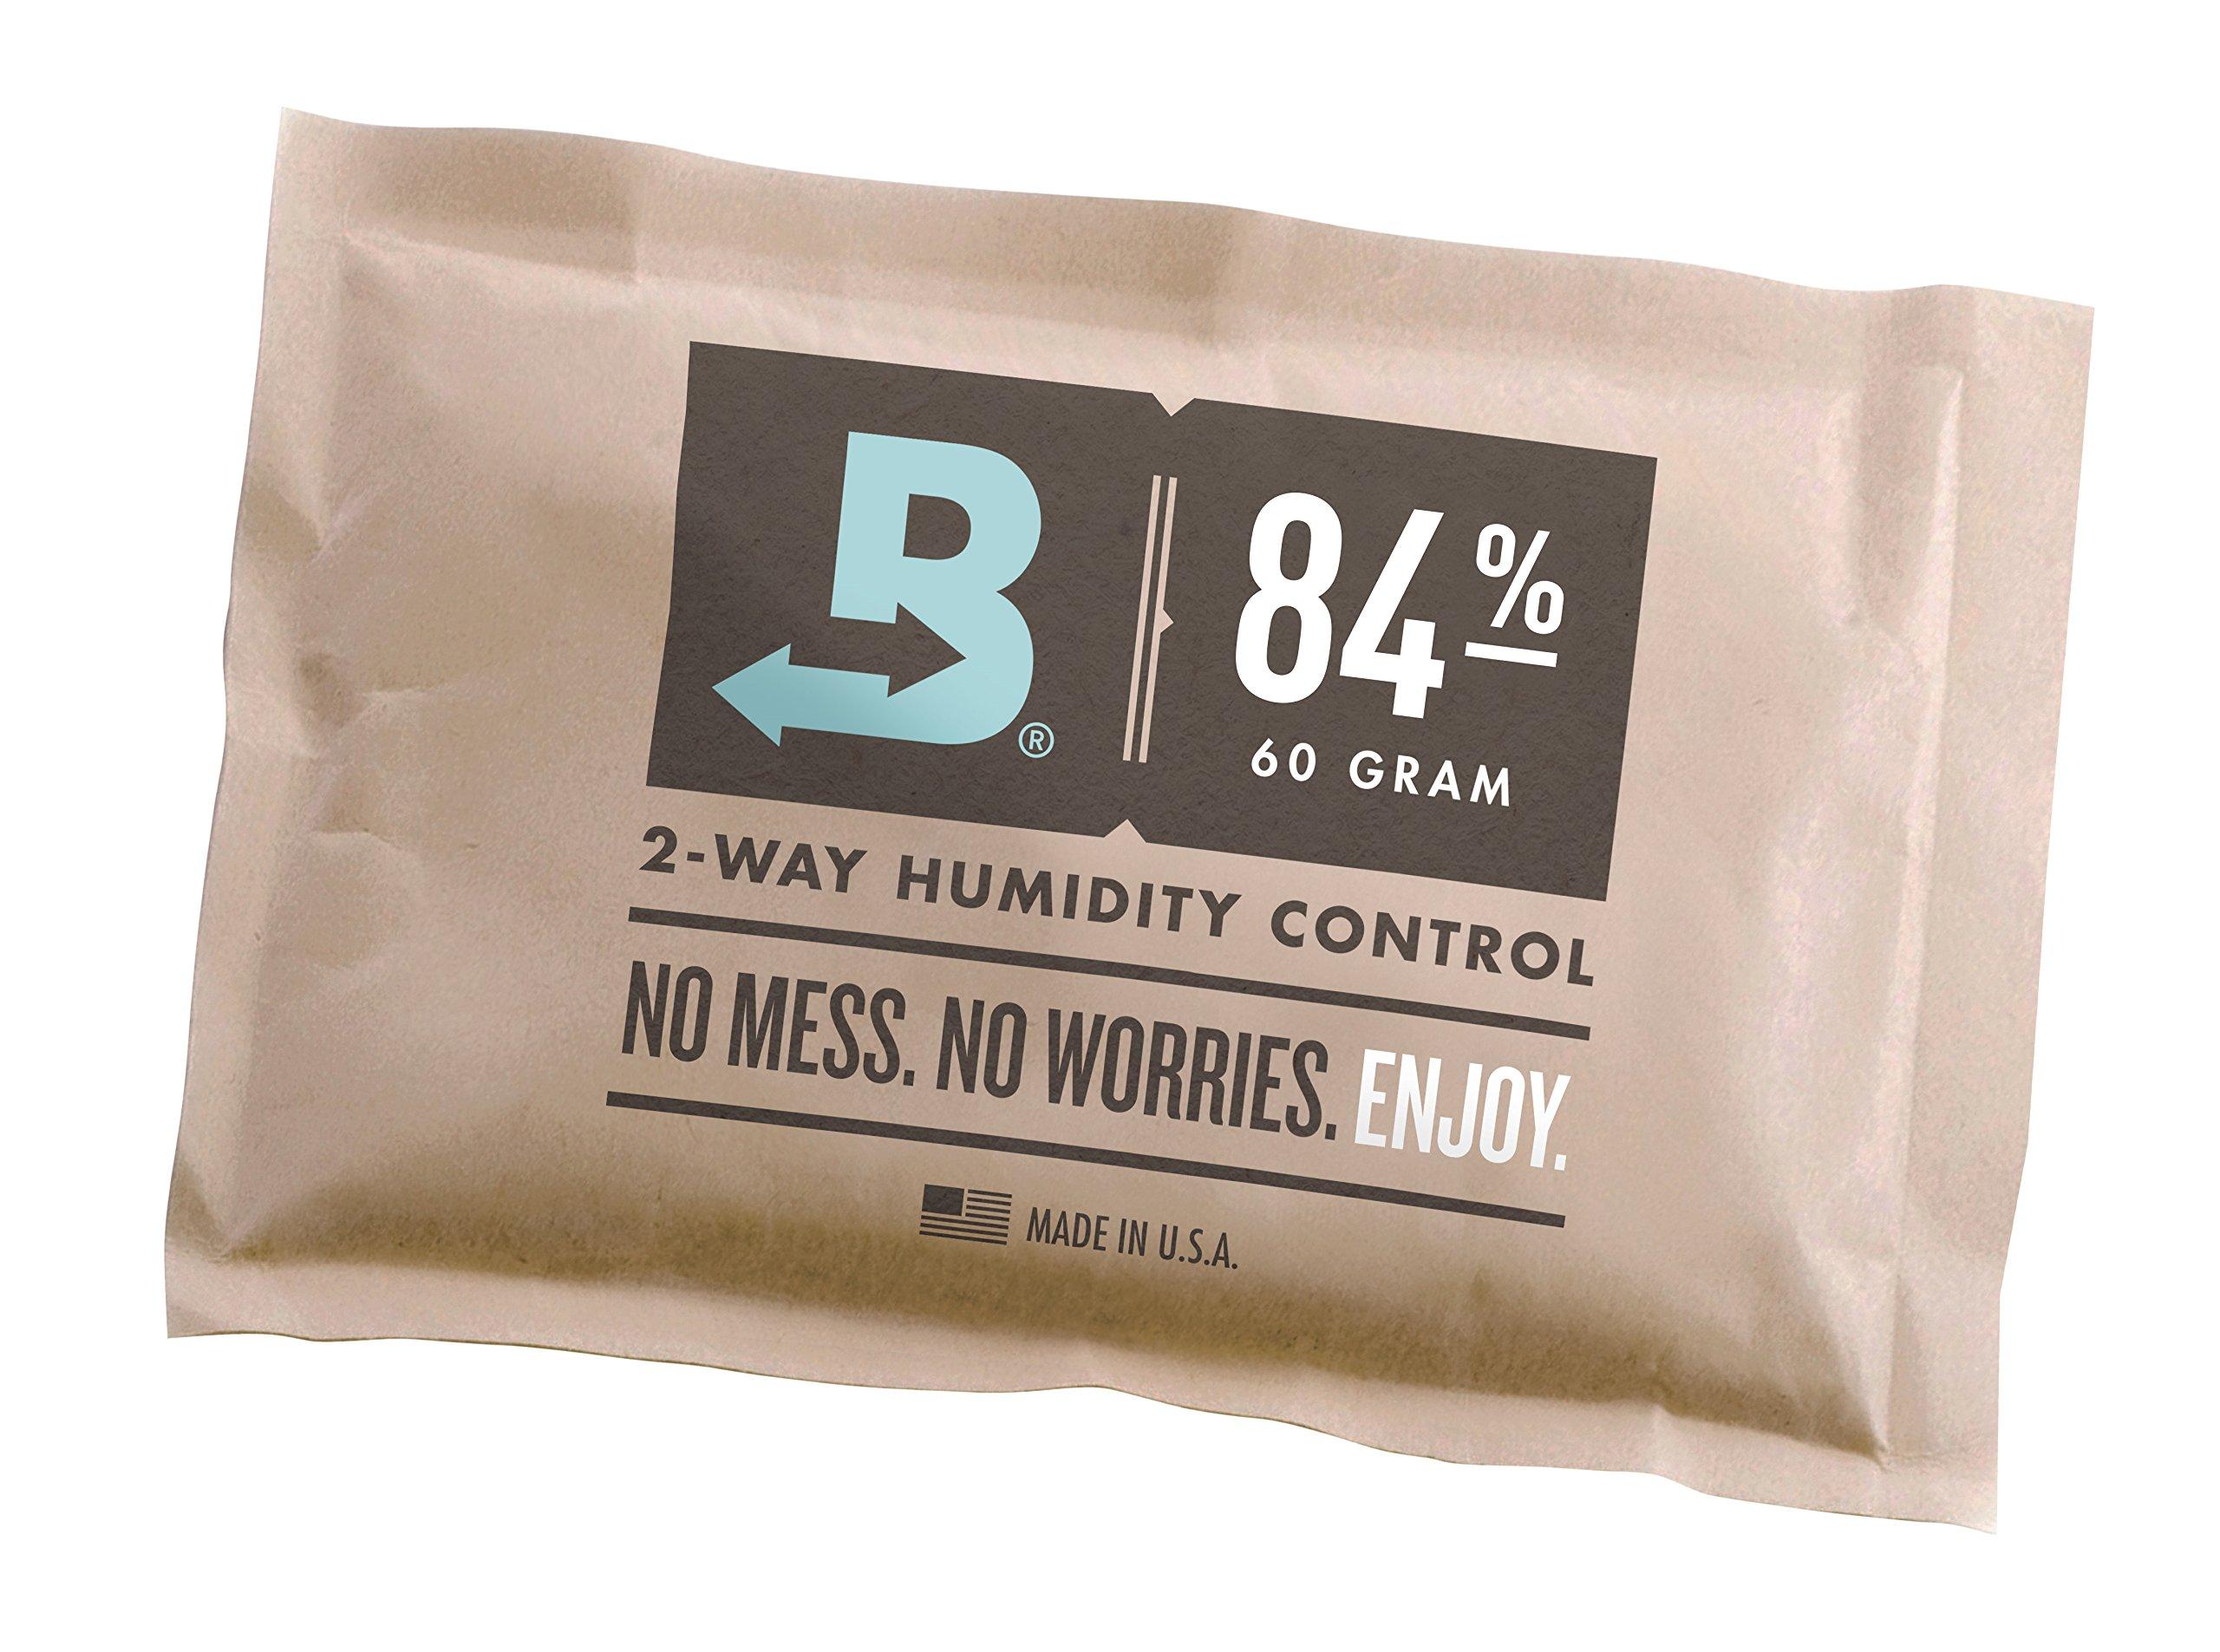 Boveda 84% RH for Humidor Seasoning, Large 60 gram